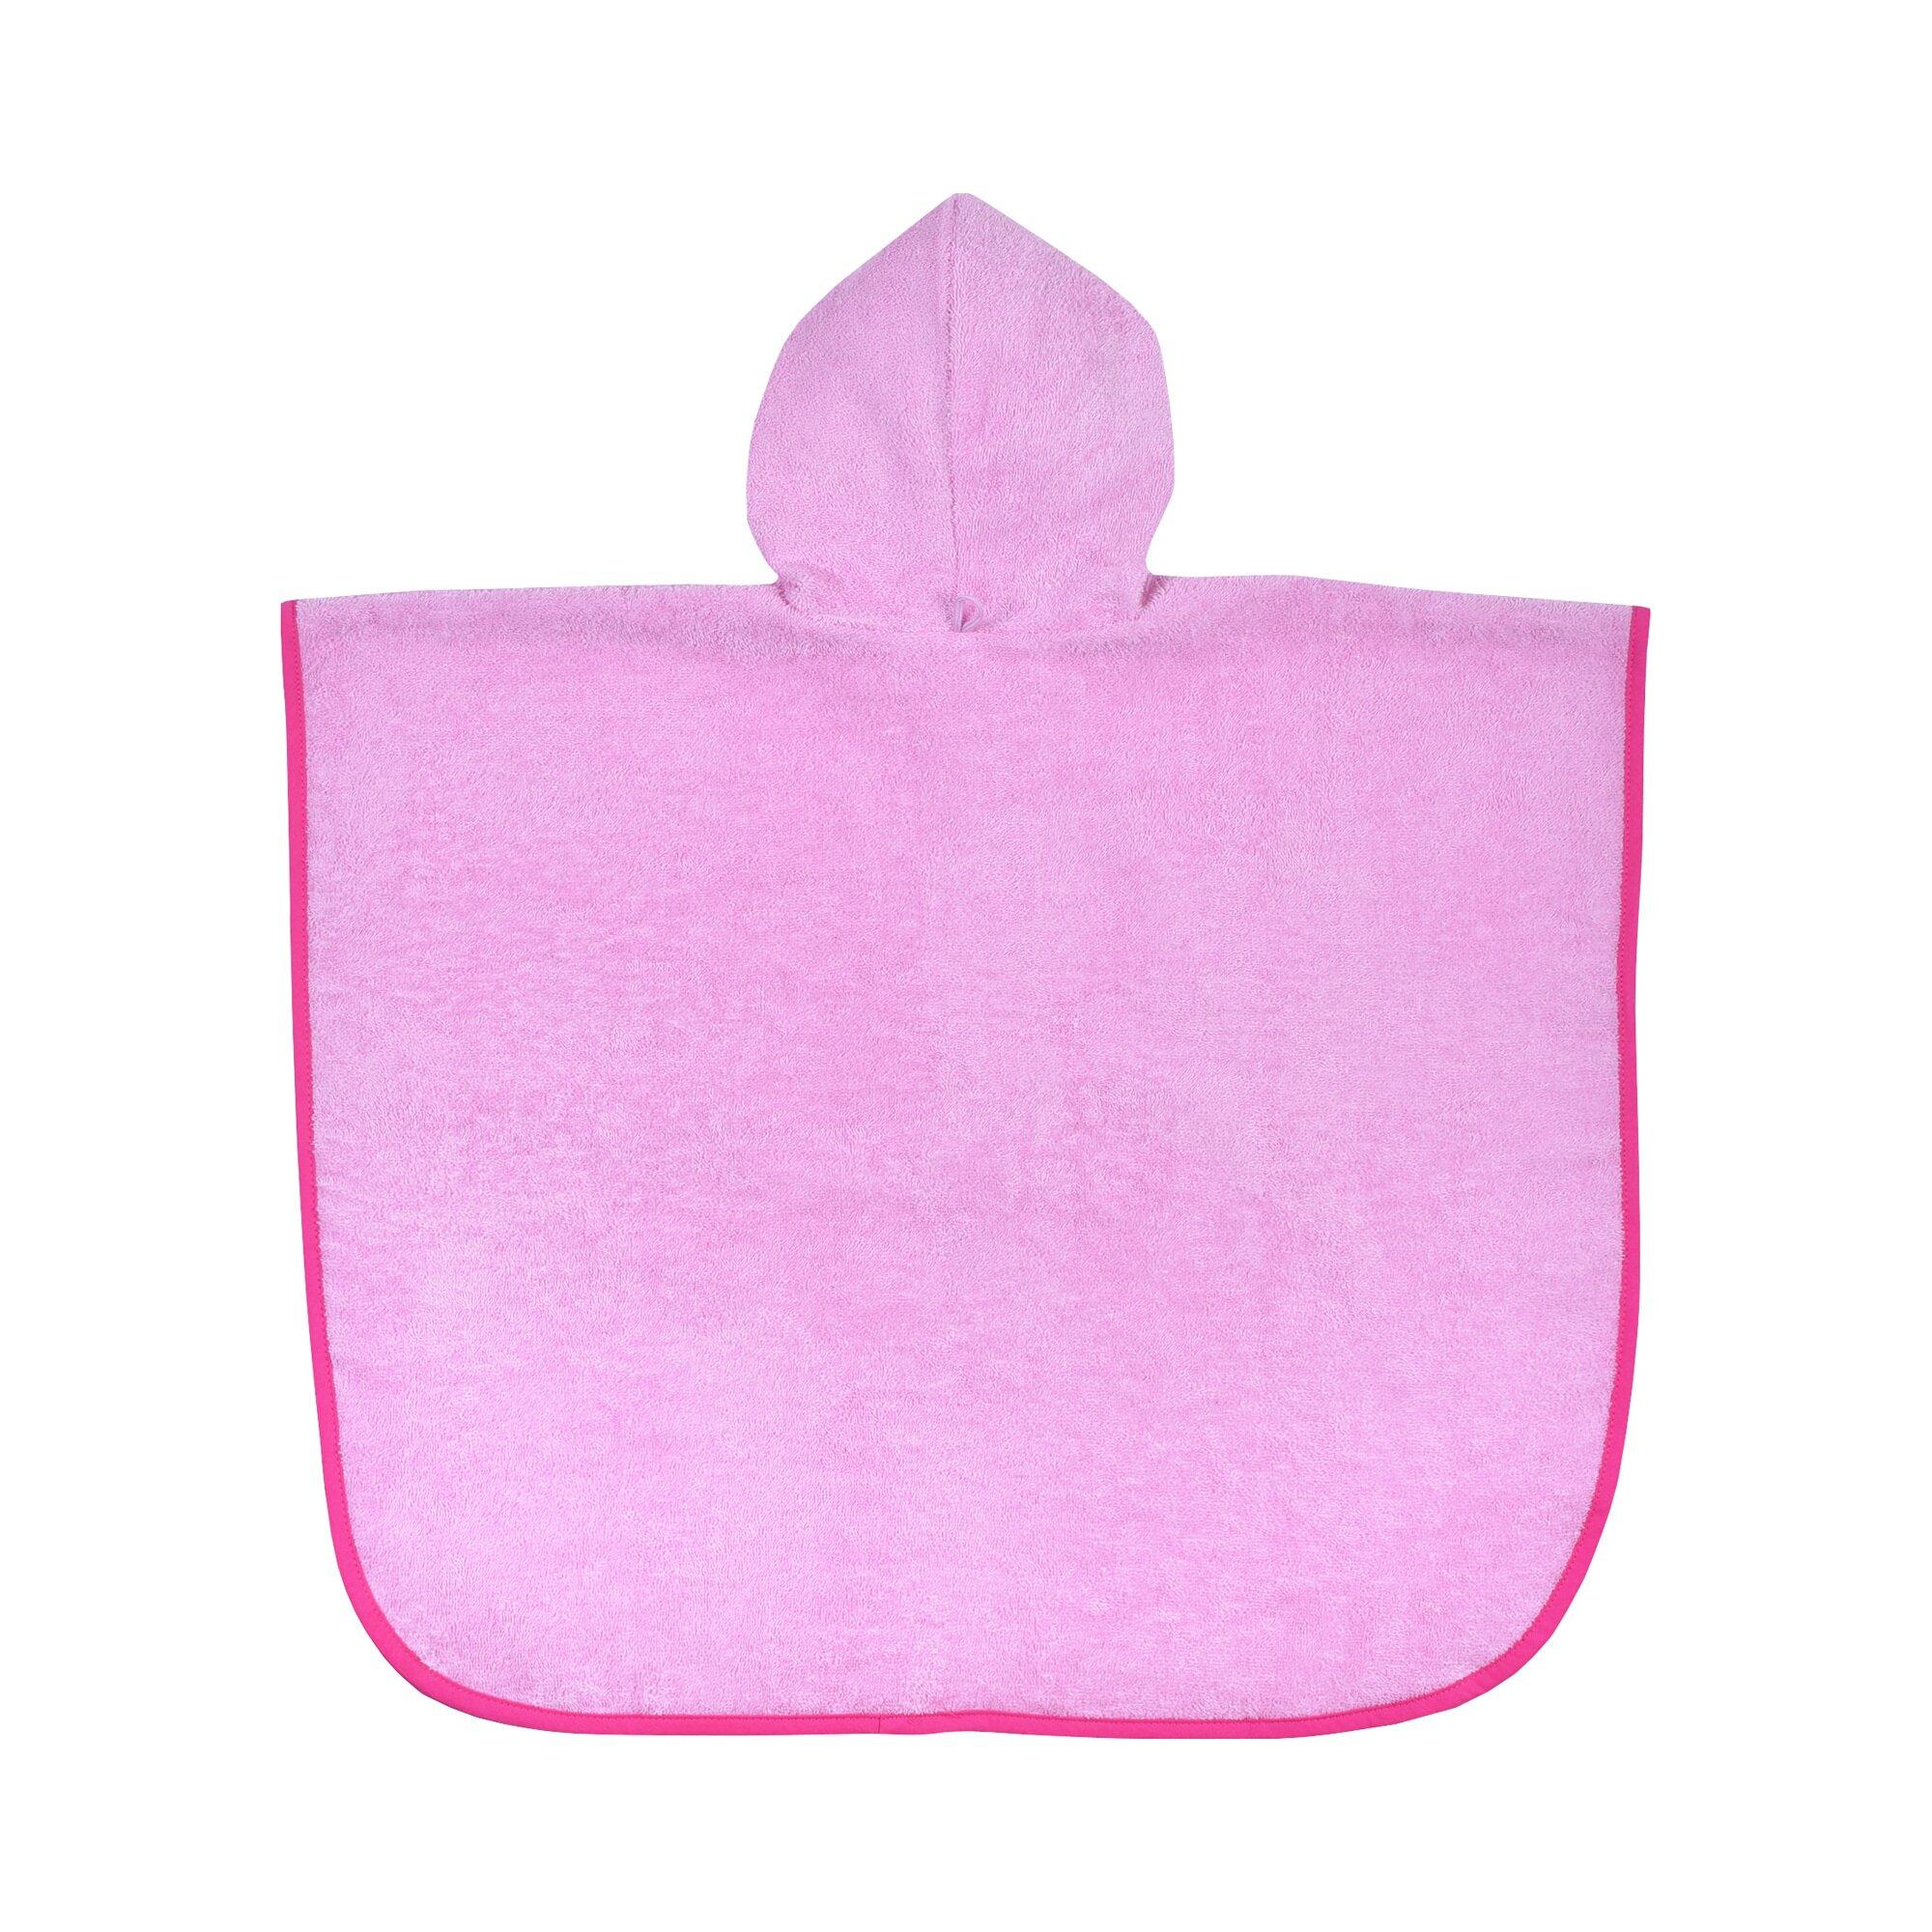 worner-badeponcho-tierpyramide-rosa